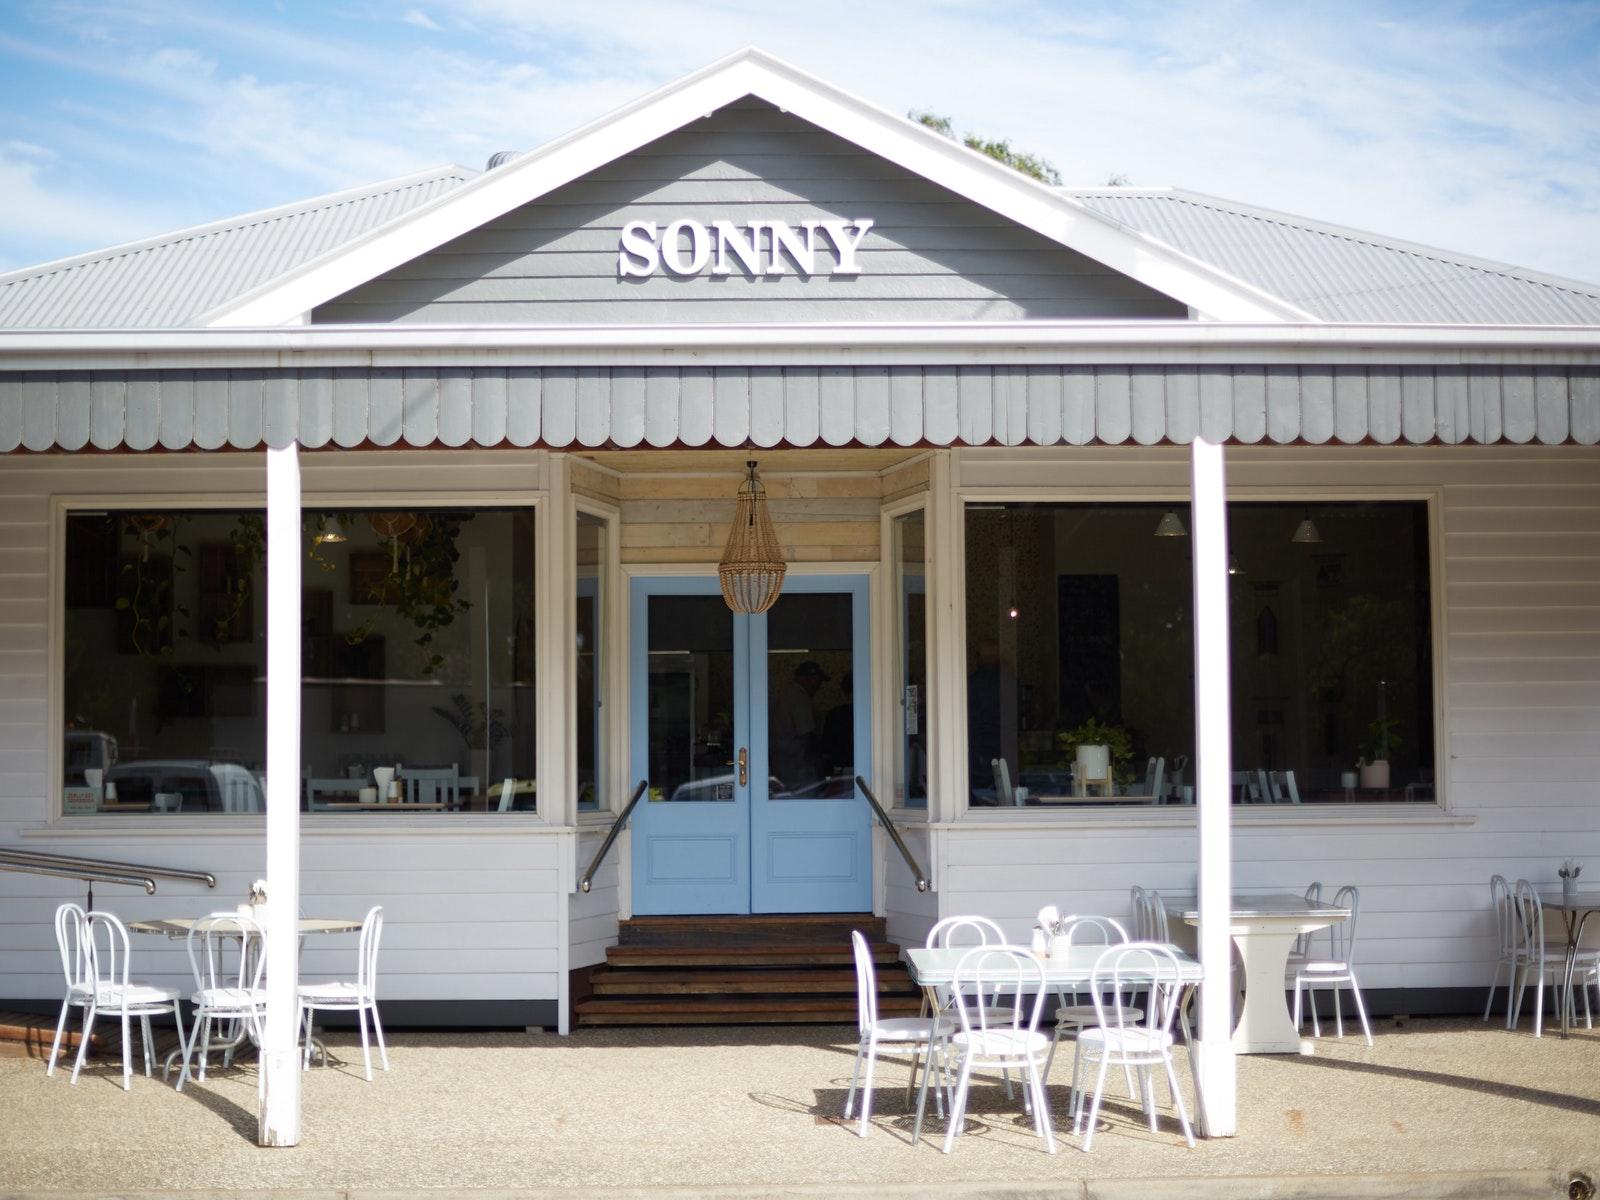 Sonny Shop Front